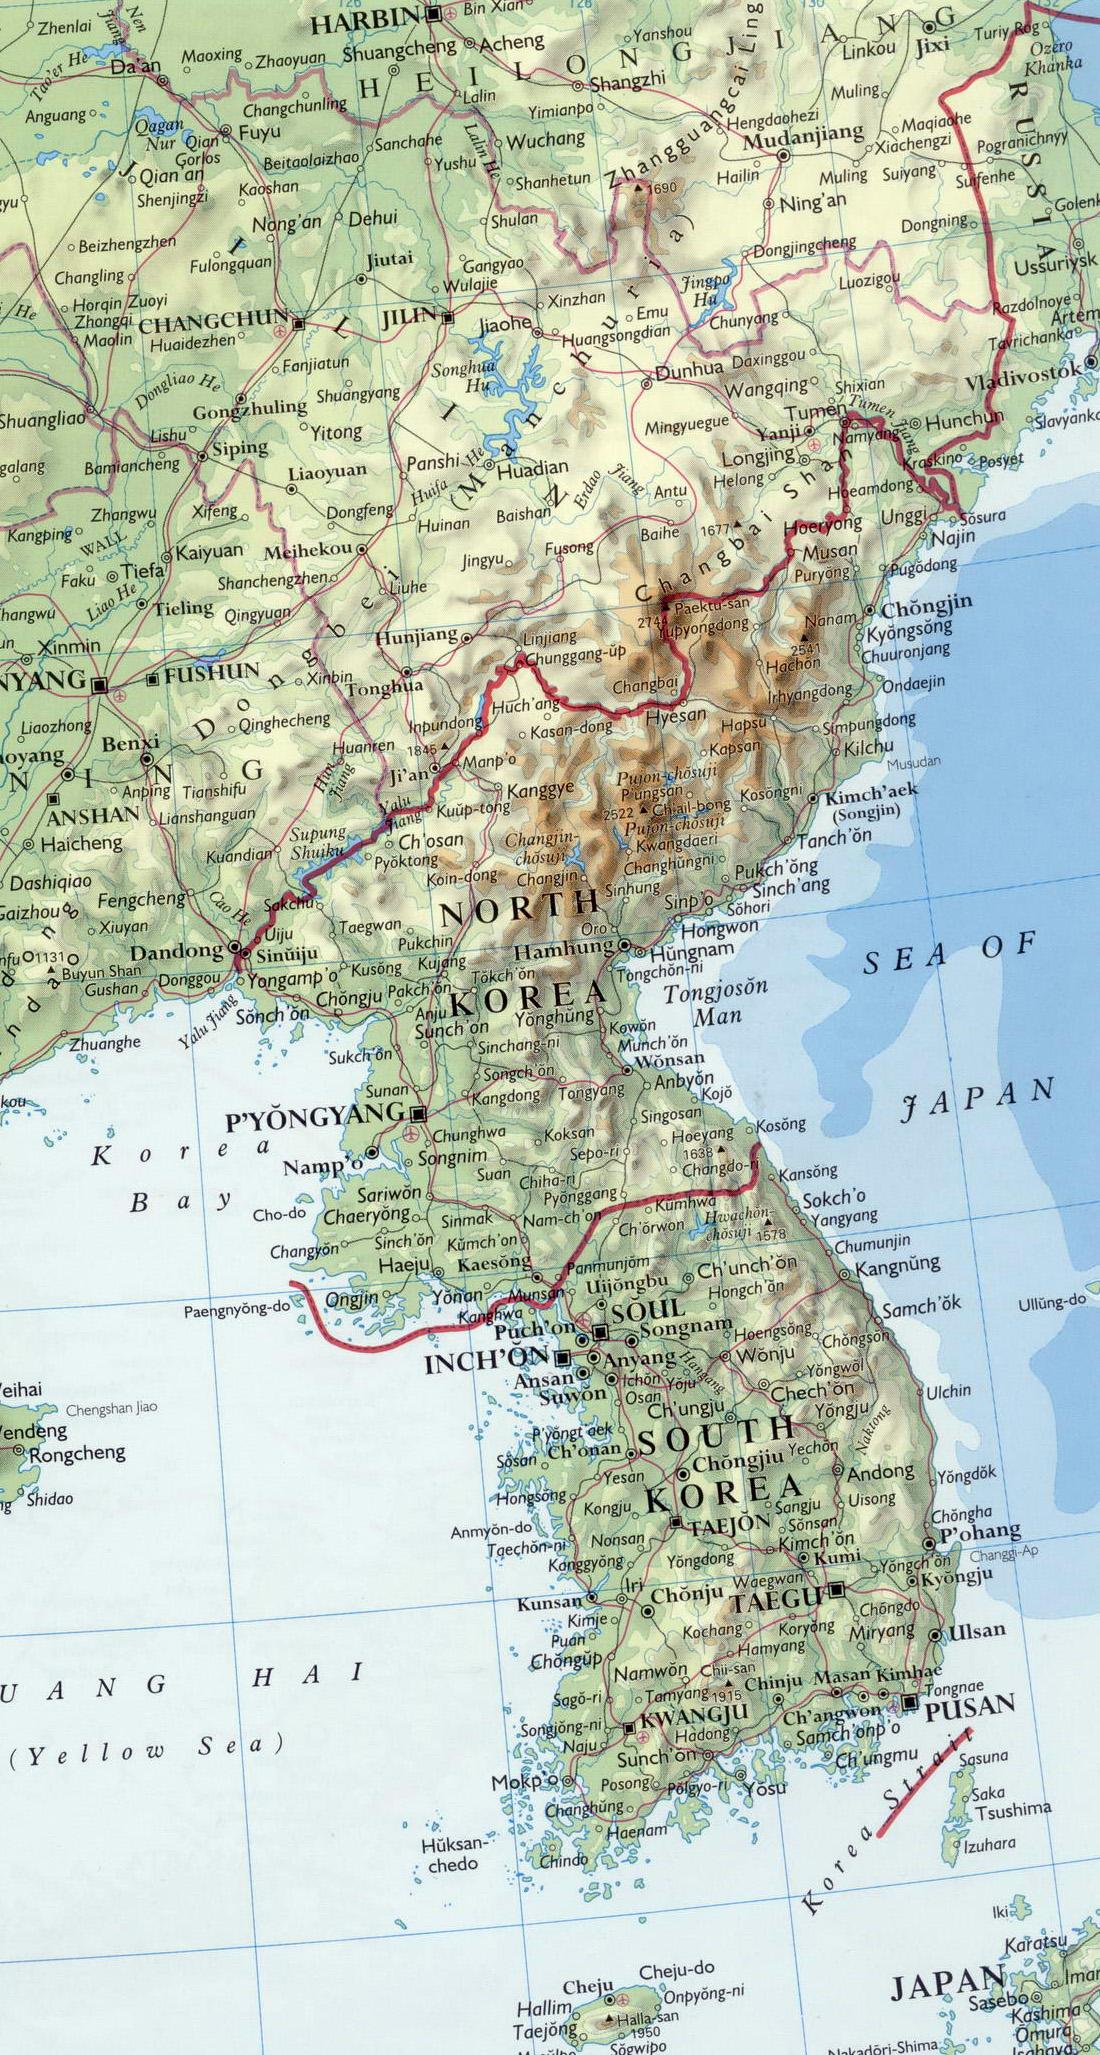 north korea location in world map #4, wiring, north korea location in world map